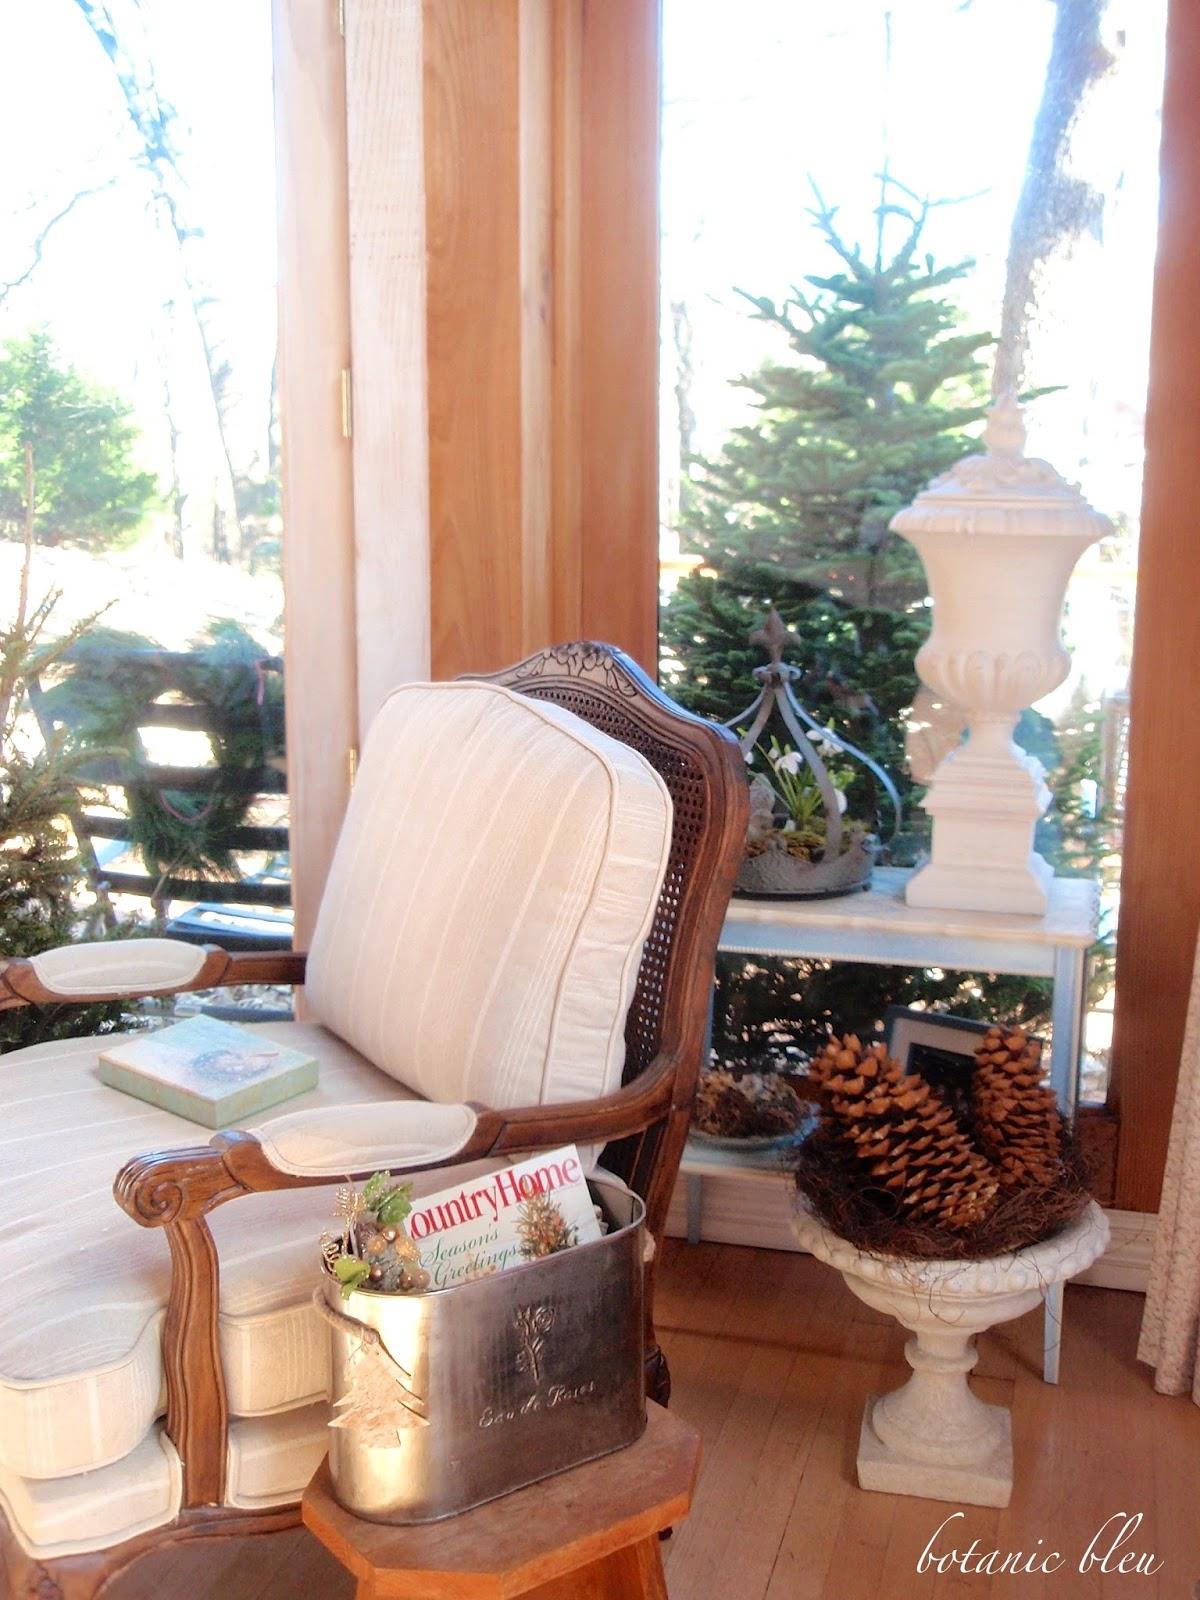 botanic bleu easy christmas decor - Wholesale Country Christmas Decor